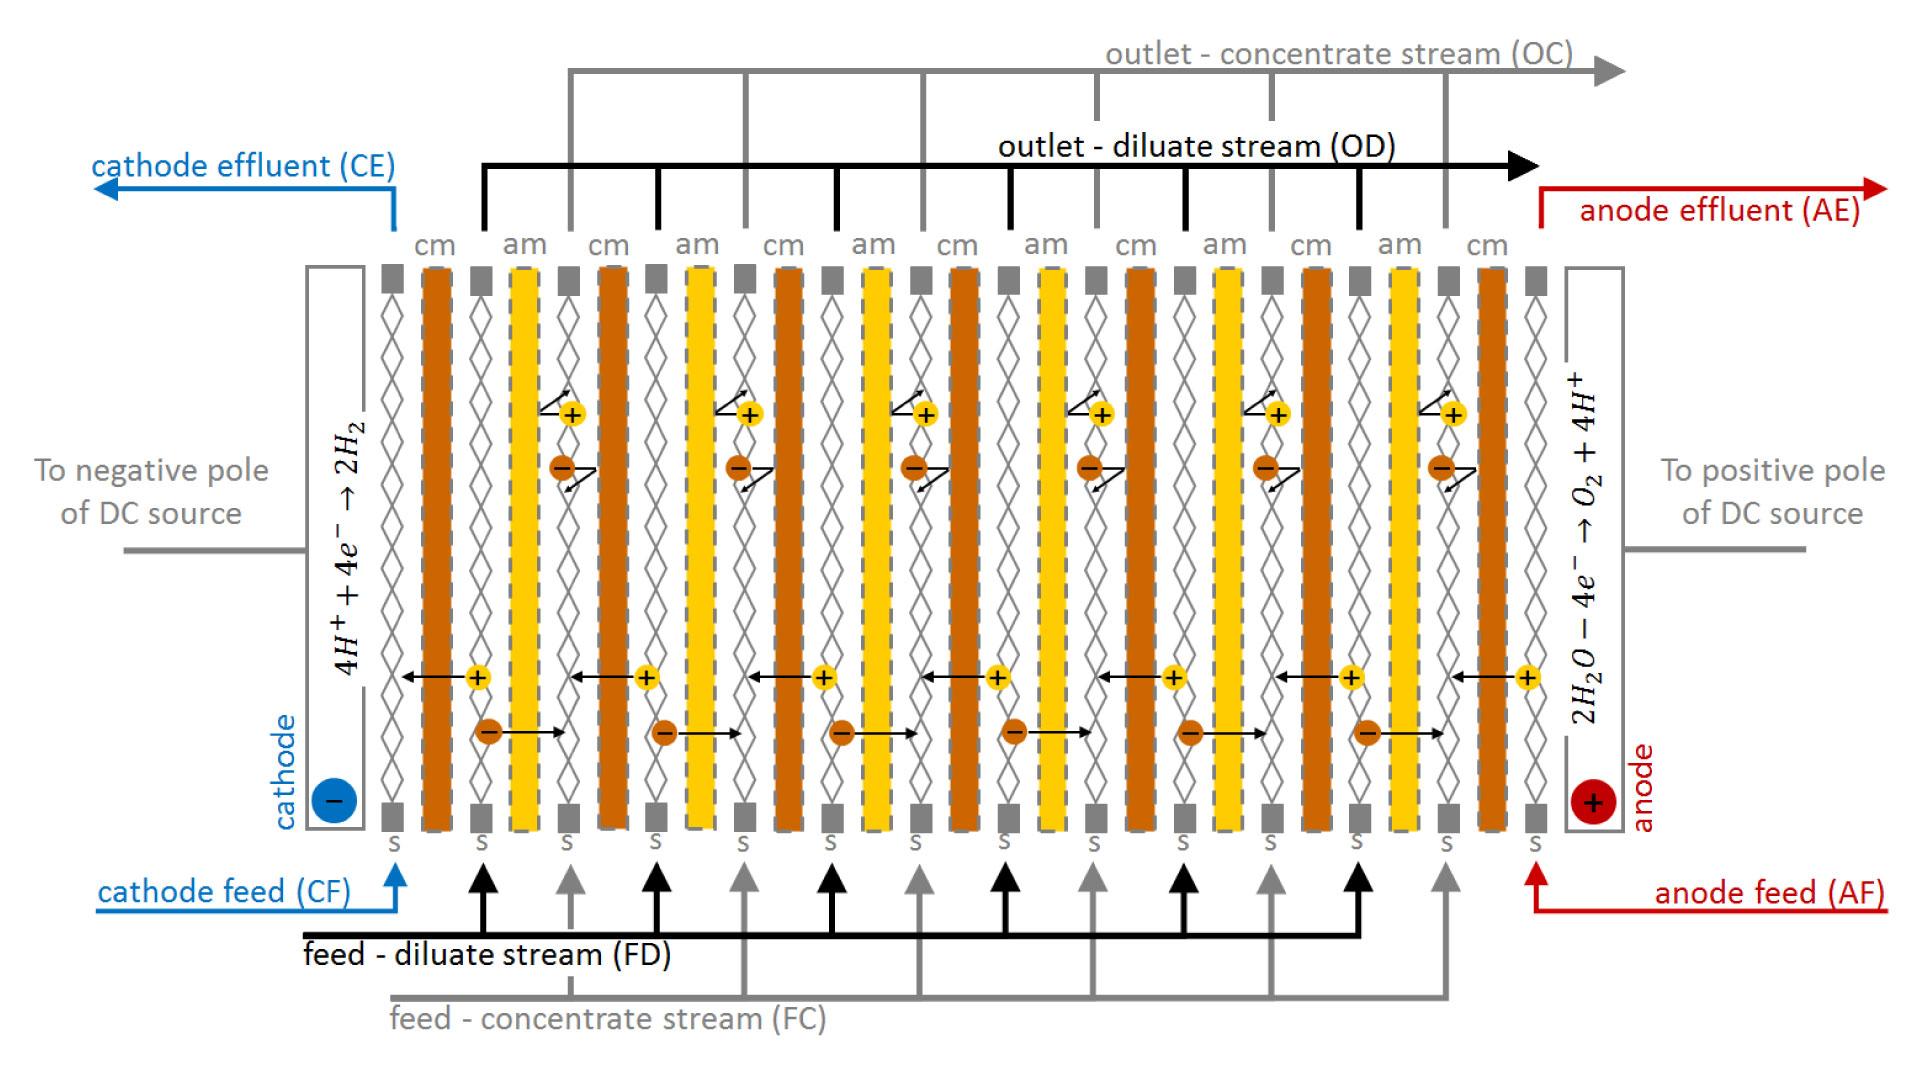 EDM Teknolojisi – Elektrodiyaliz Metatezi (EDM) Prosesi